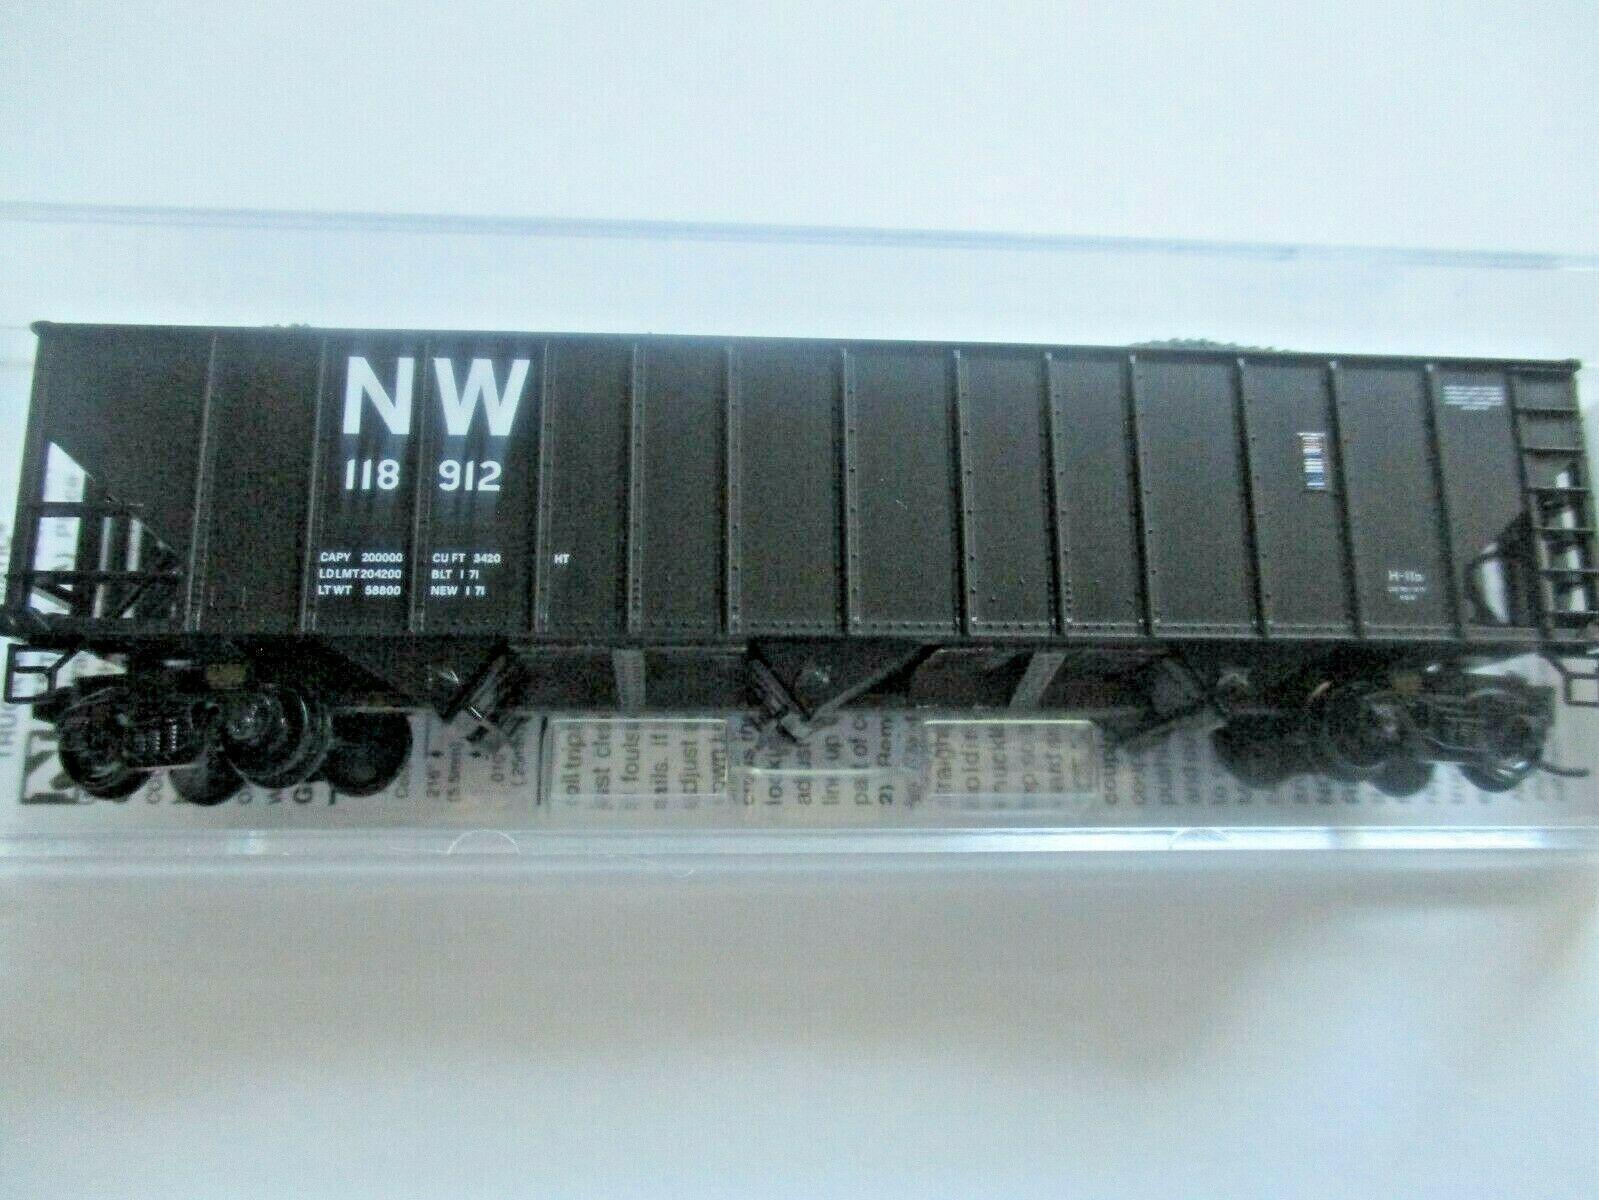 Micro-Trains # 10800422 Norfolk & Western 100-Ton 3-Bay Hopper with Coal Load (N